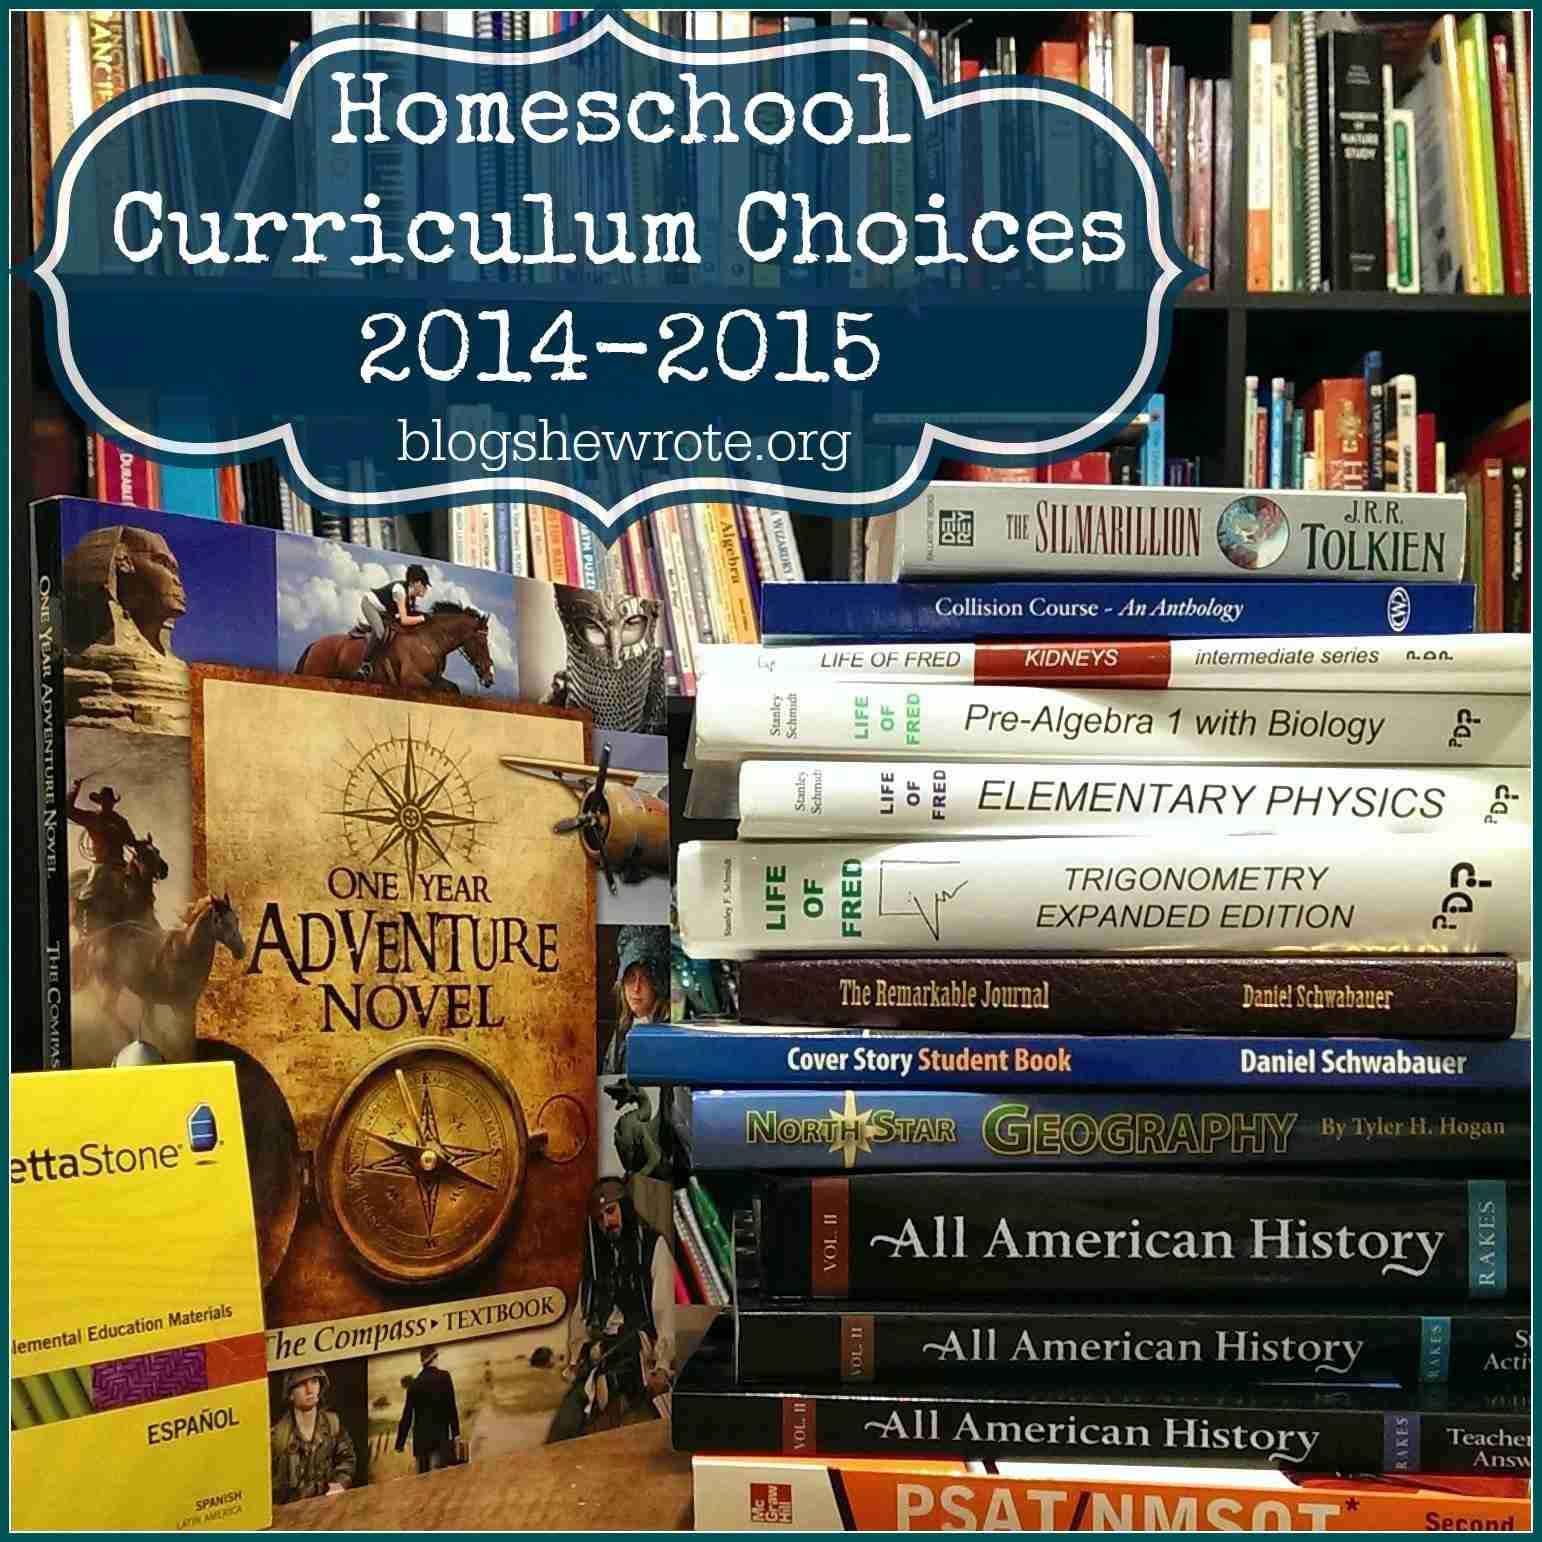 Blog, She Wrote: Homeschool Curriculum Choices 2014-2015